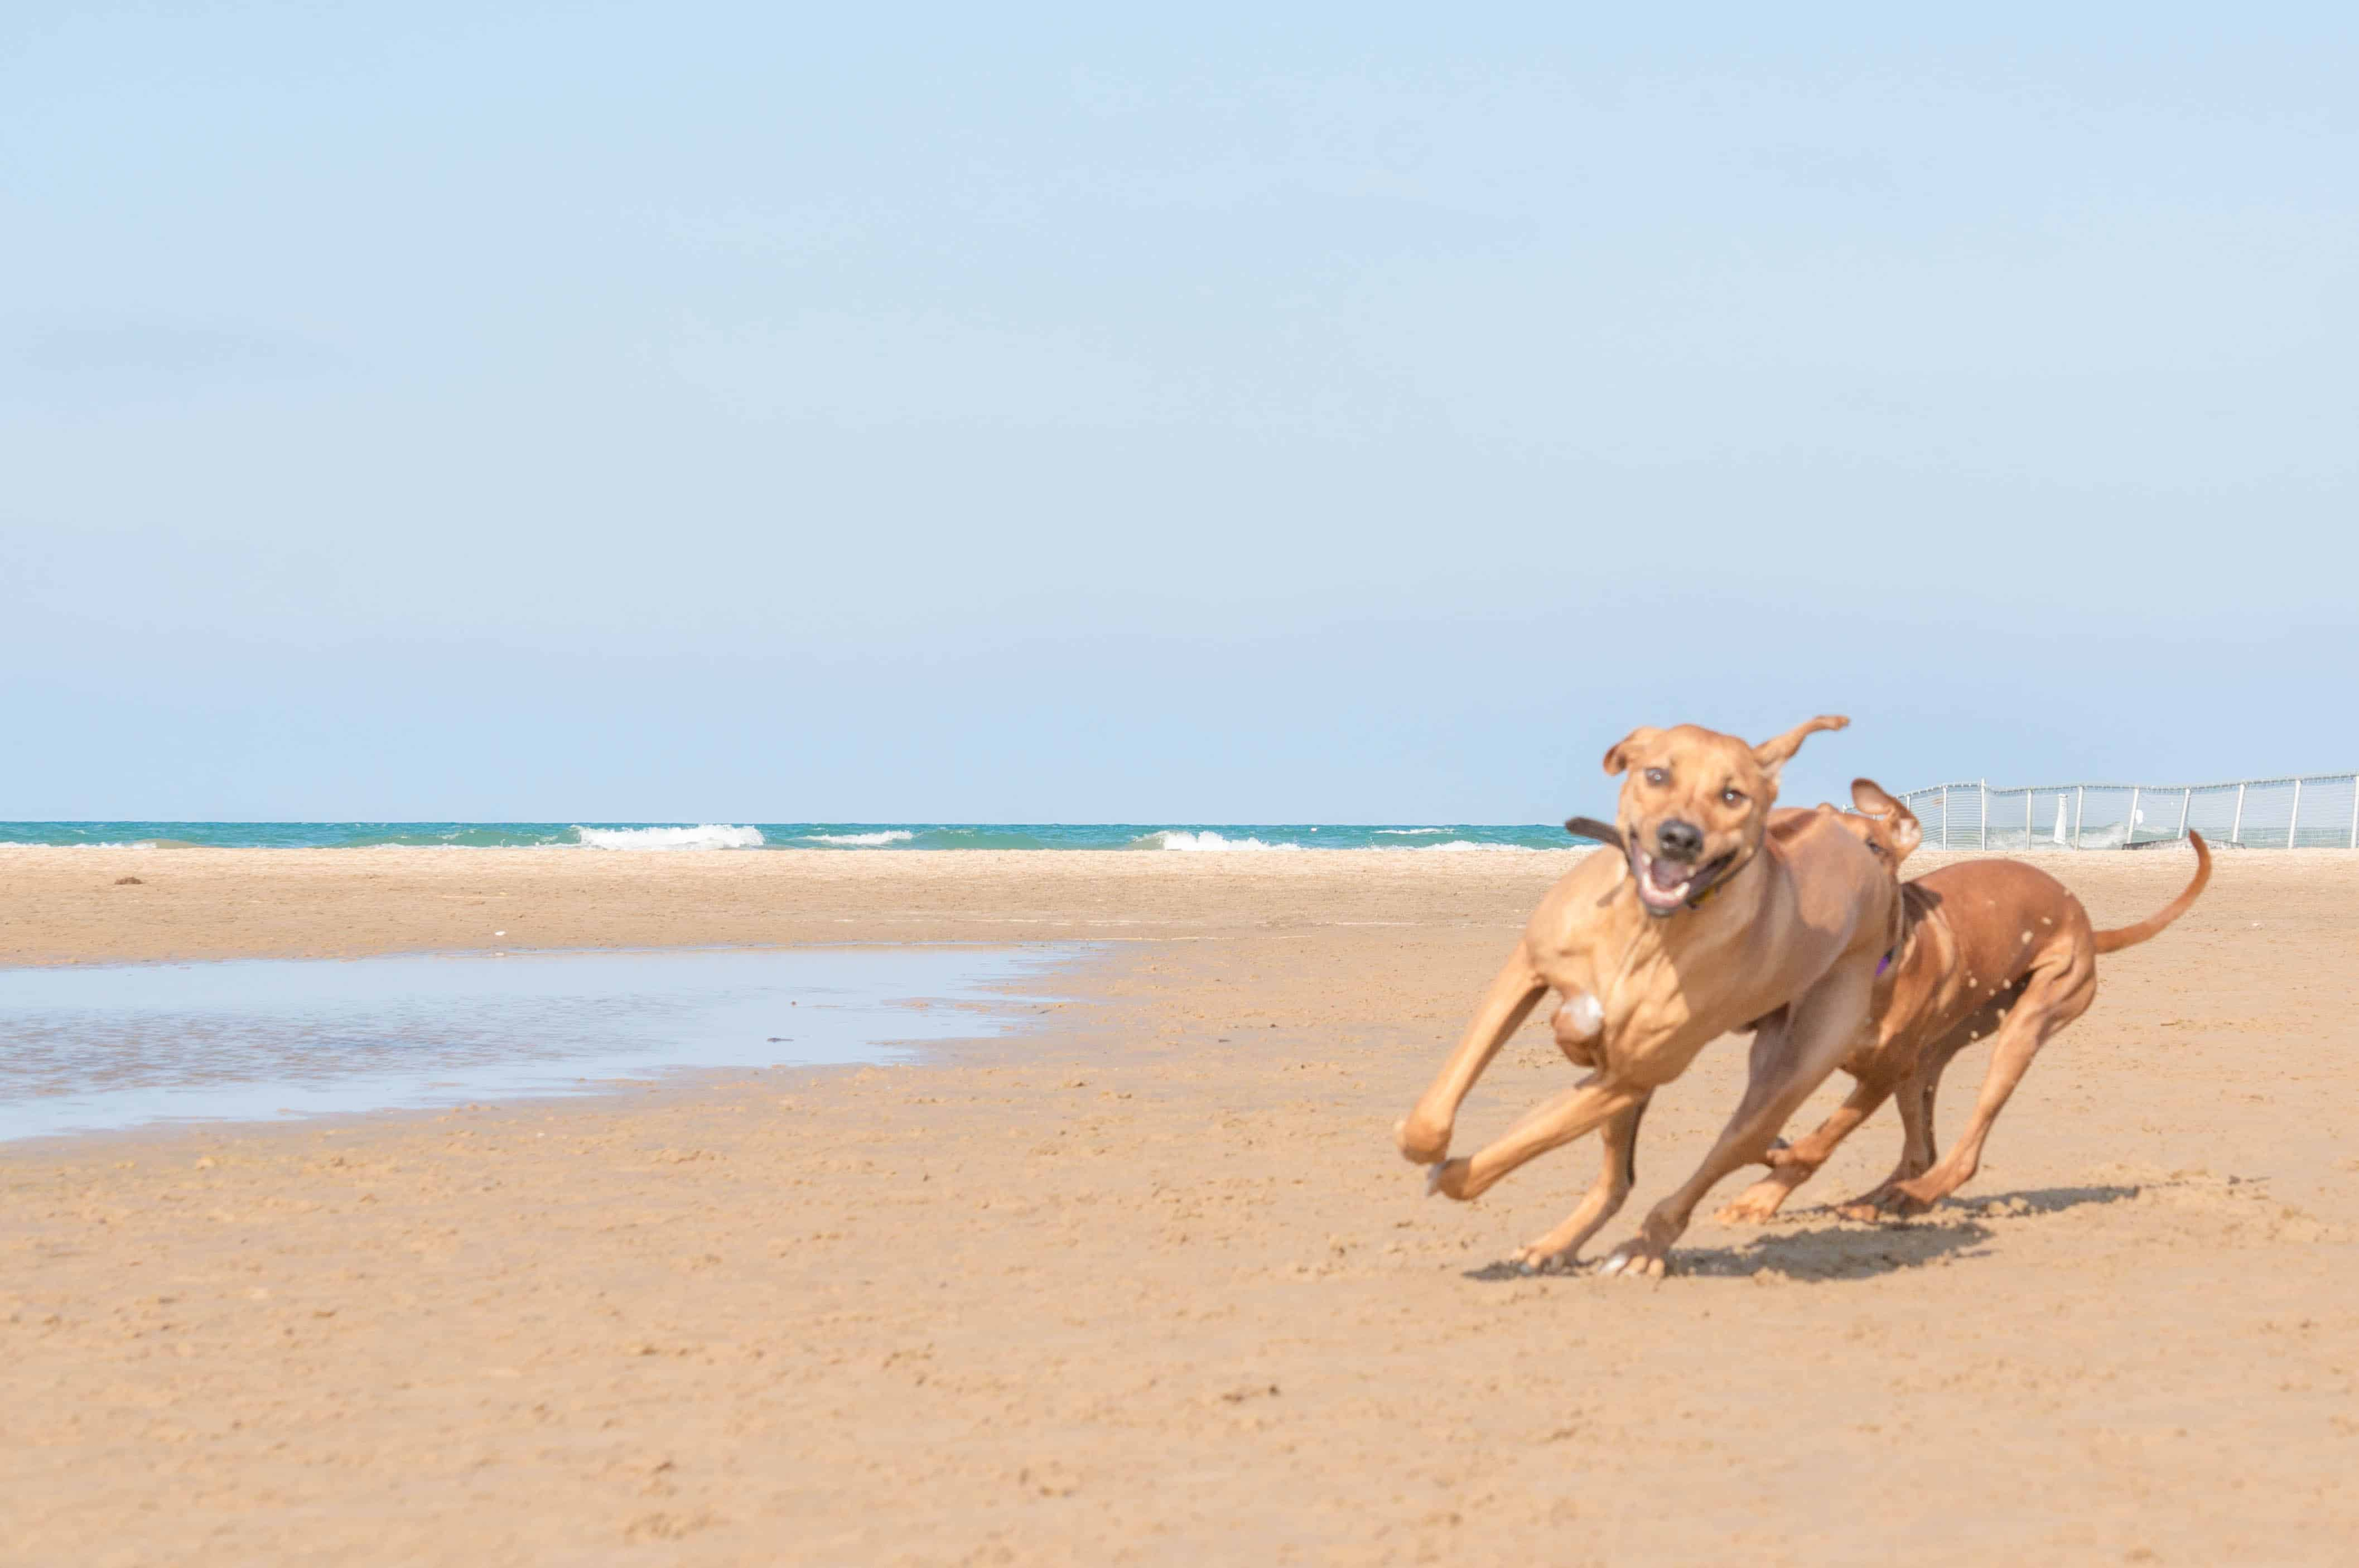 Rhodesian Ridgeback, puppy, chicago, adventure, dog beach, marking our territory